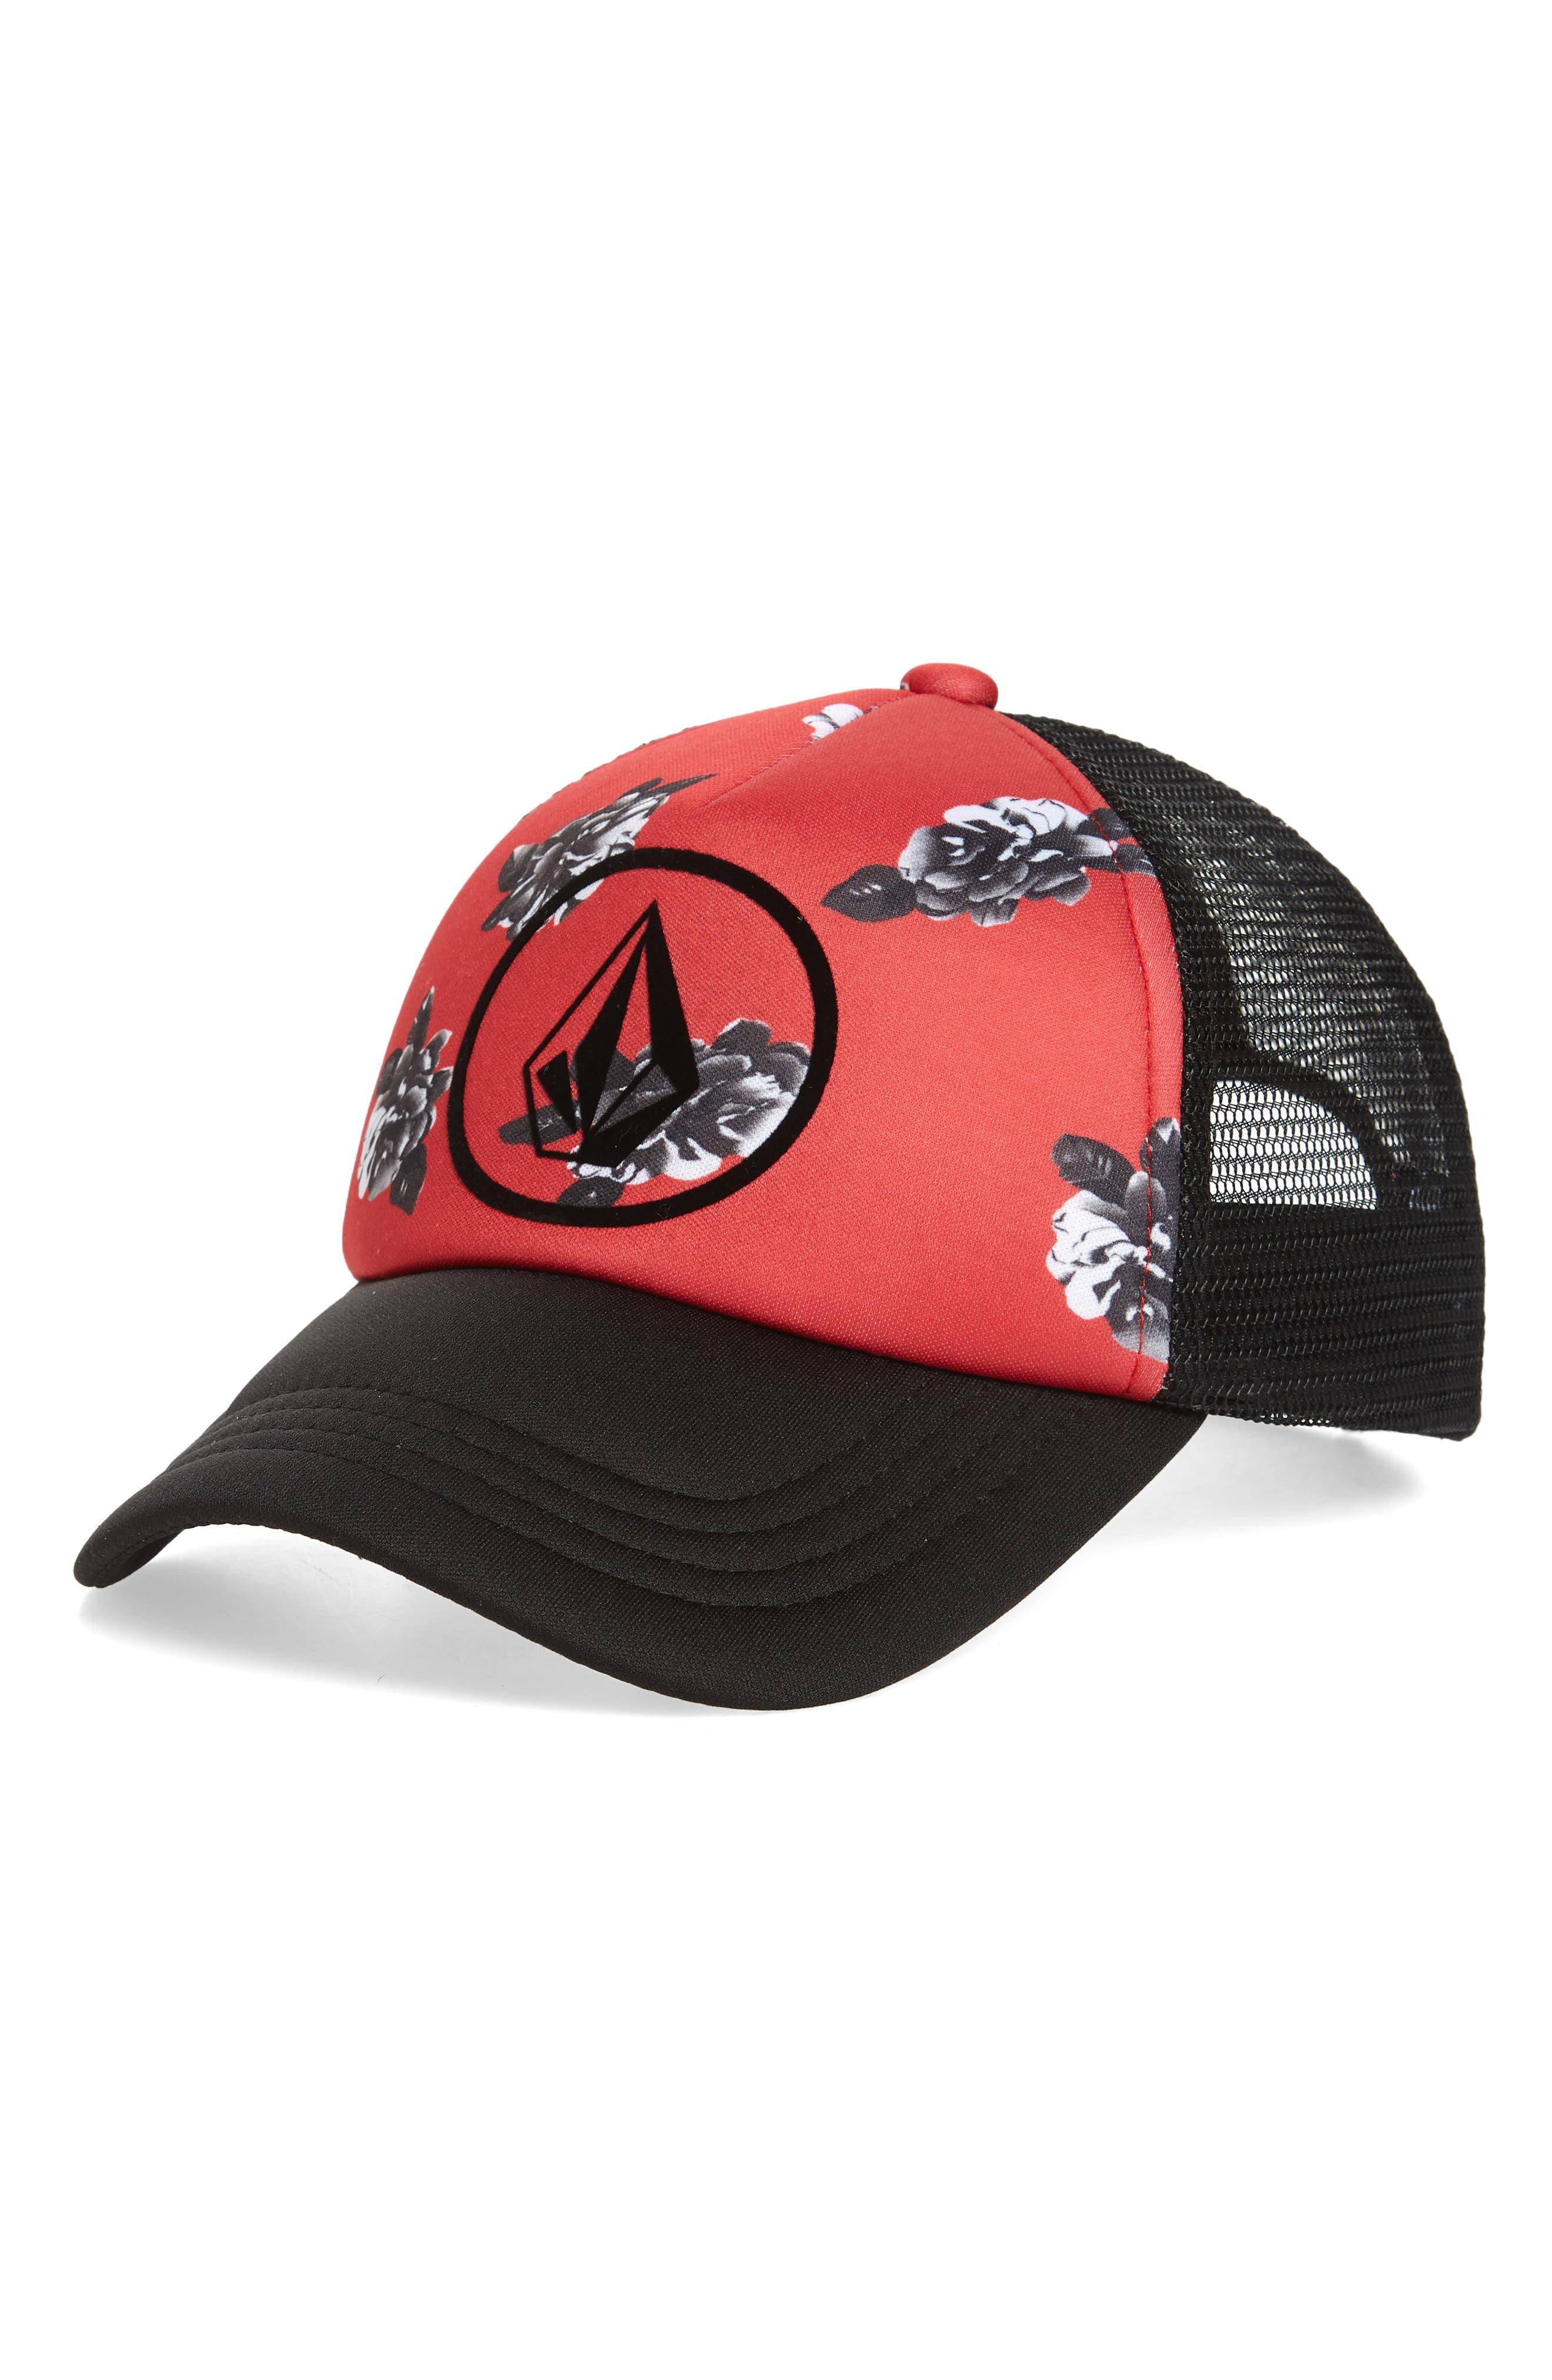 Tagurit Trucker Hat,                             Main thumbnail 1, color,                             Red Rad